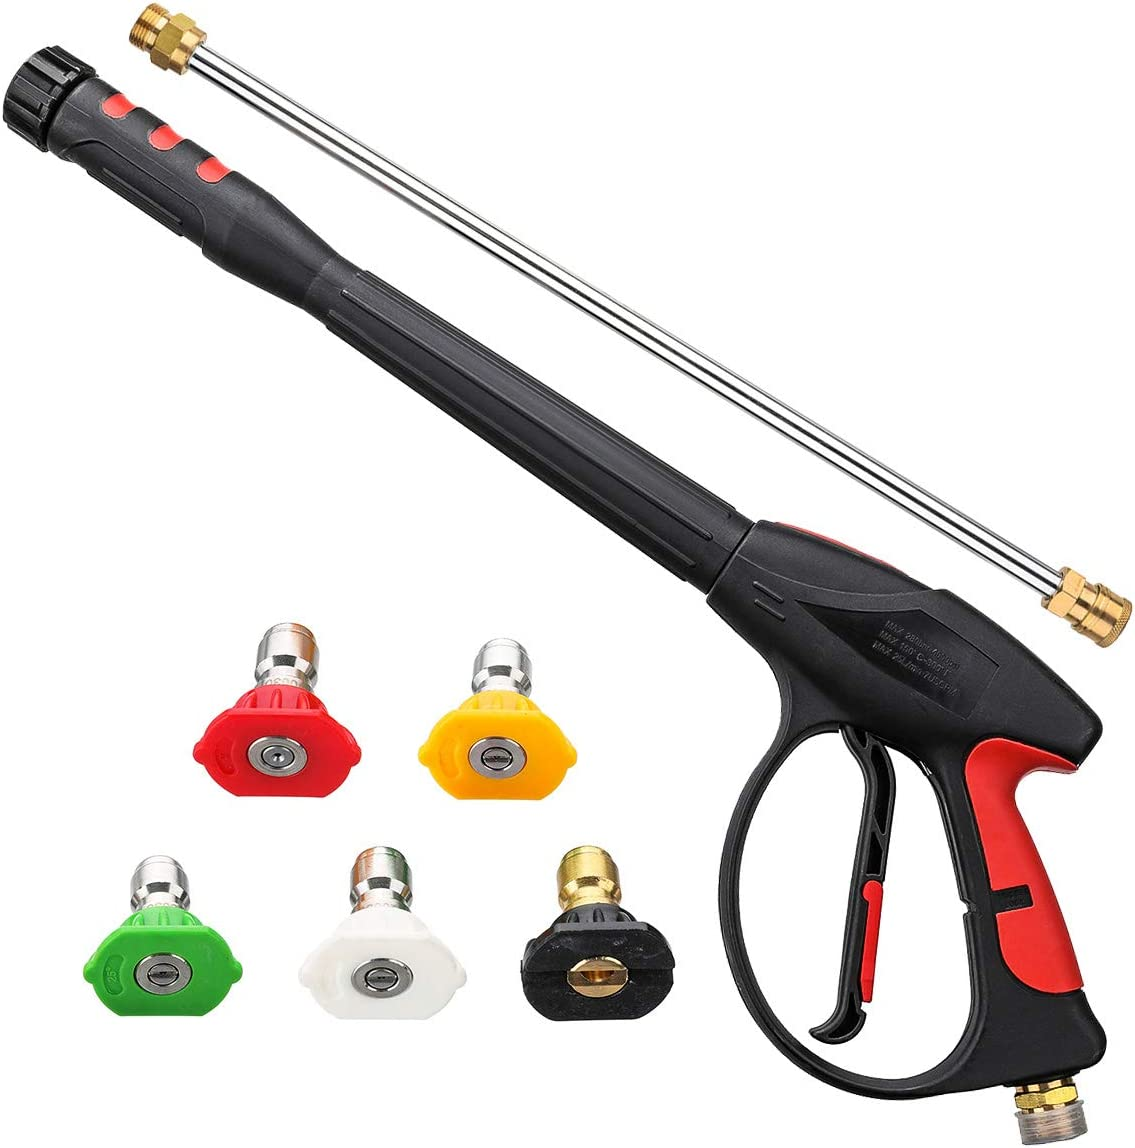 3000 PSI High Pressure Washer Gun for Pressure Power Washers w// Trigger Lock